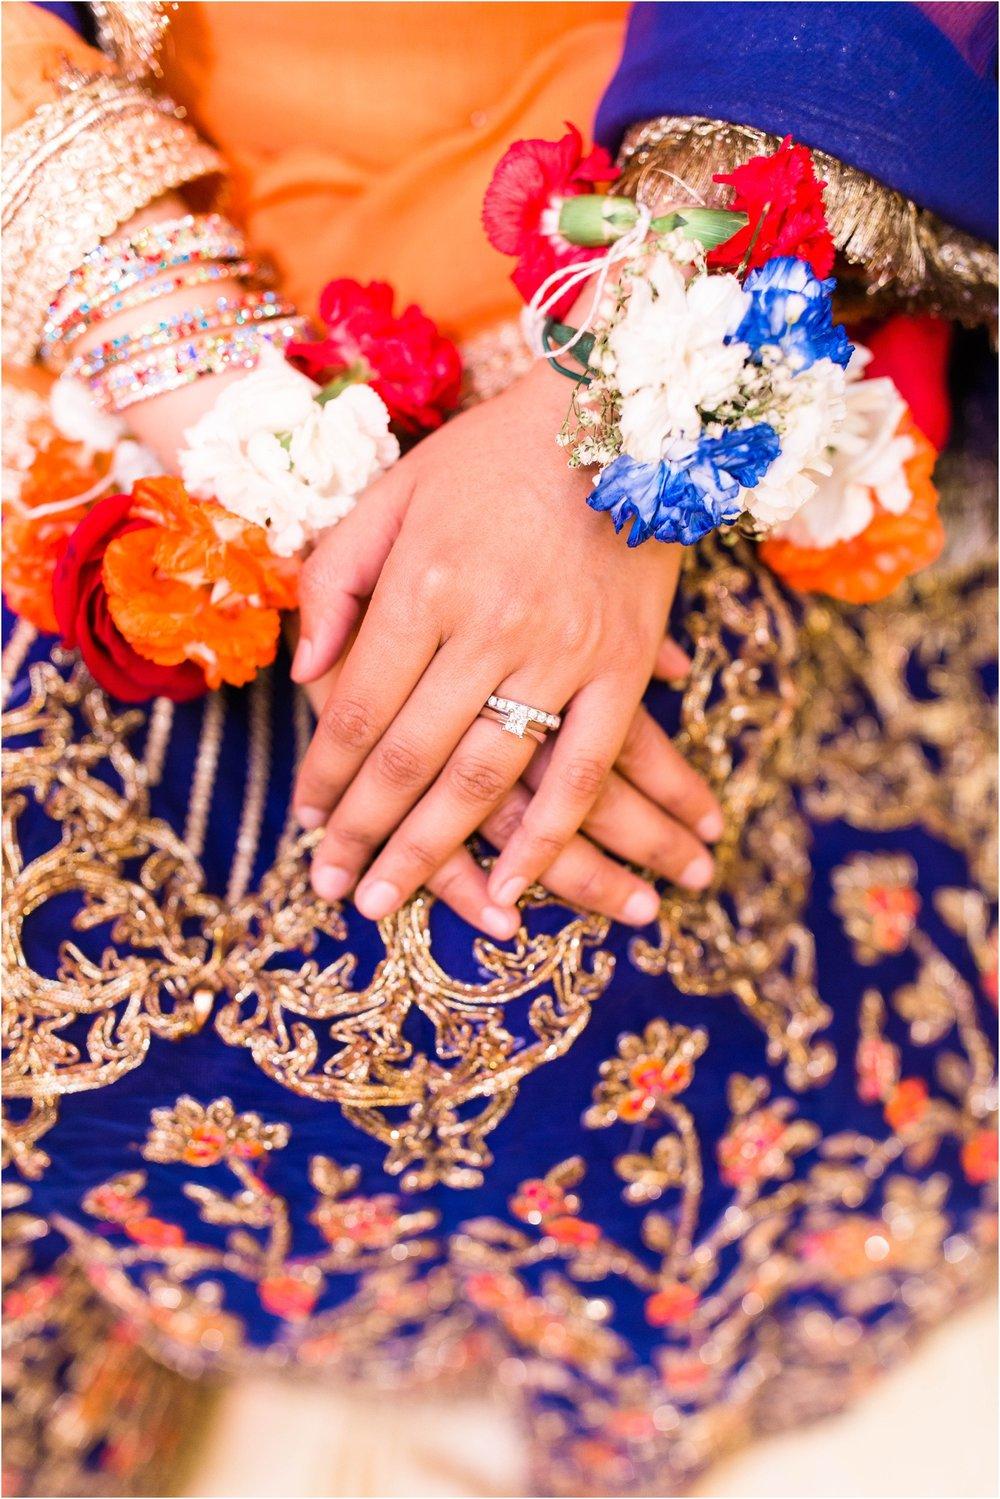 Mehndi-Markham-Convention-Centre-Toronto-Mississauga-Brampton-Scarborough-GTA-Pakistani-Indian-Wedding-Engagement-Photographer-Photography_0019.jpg